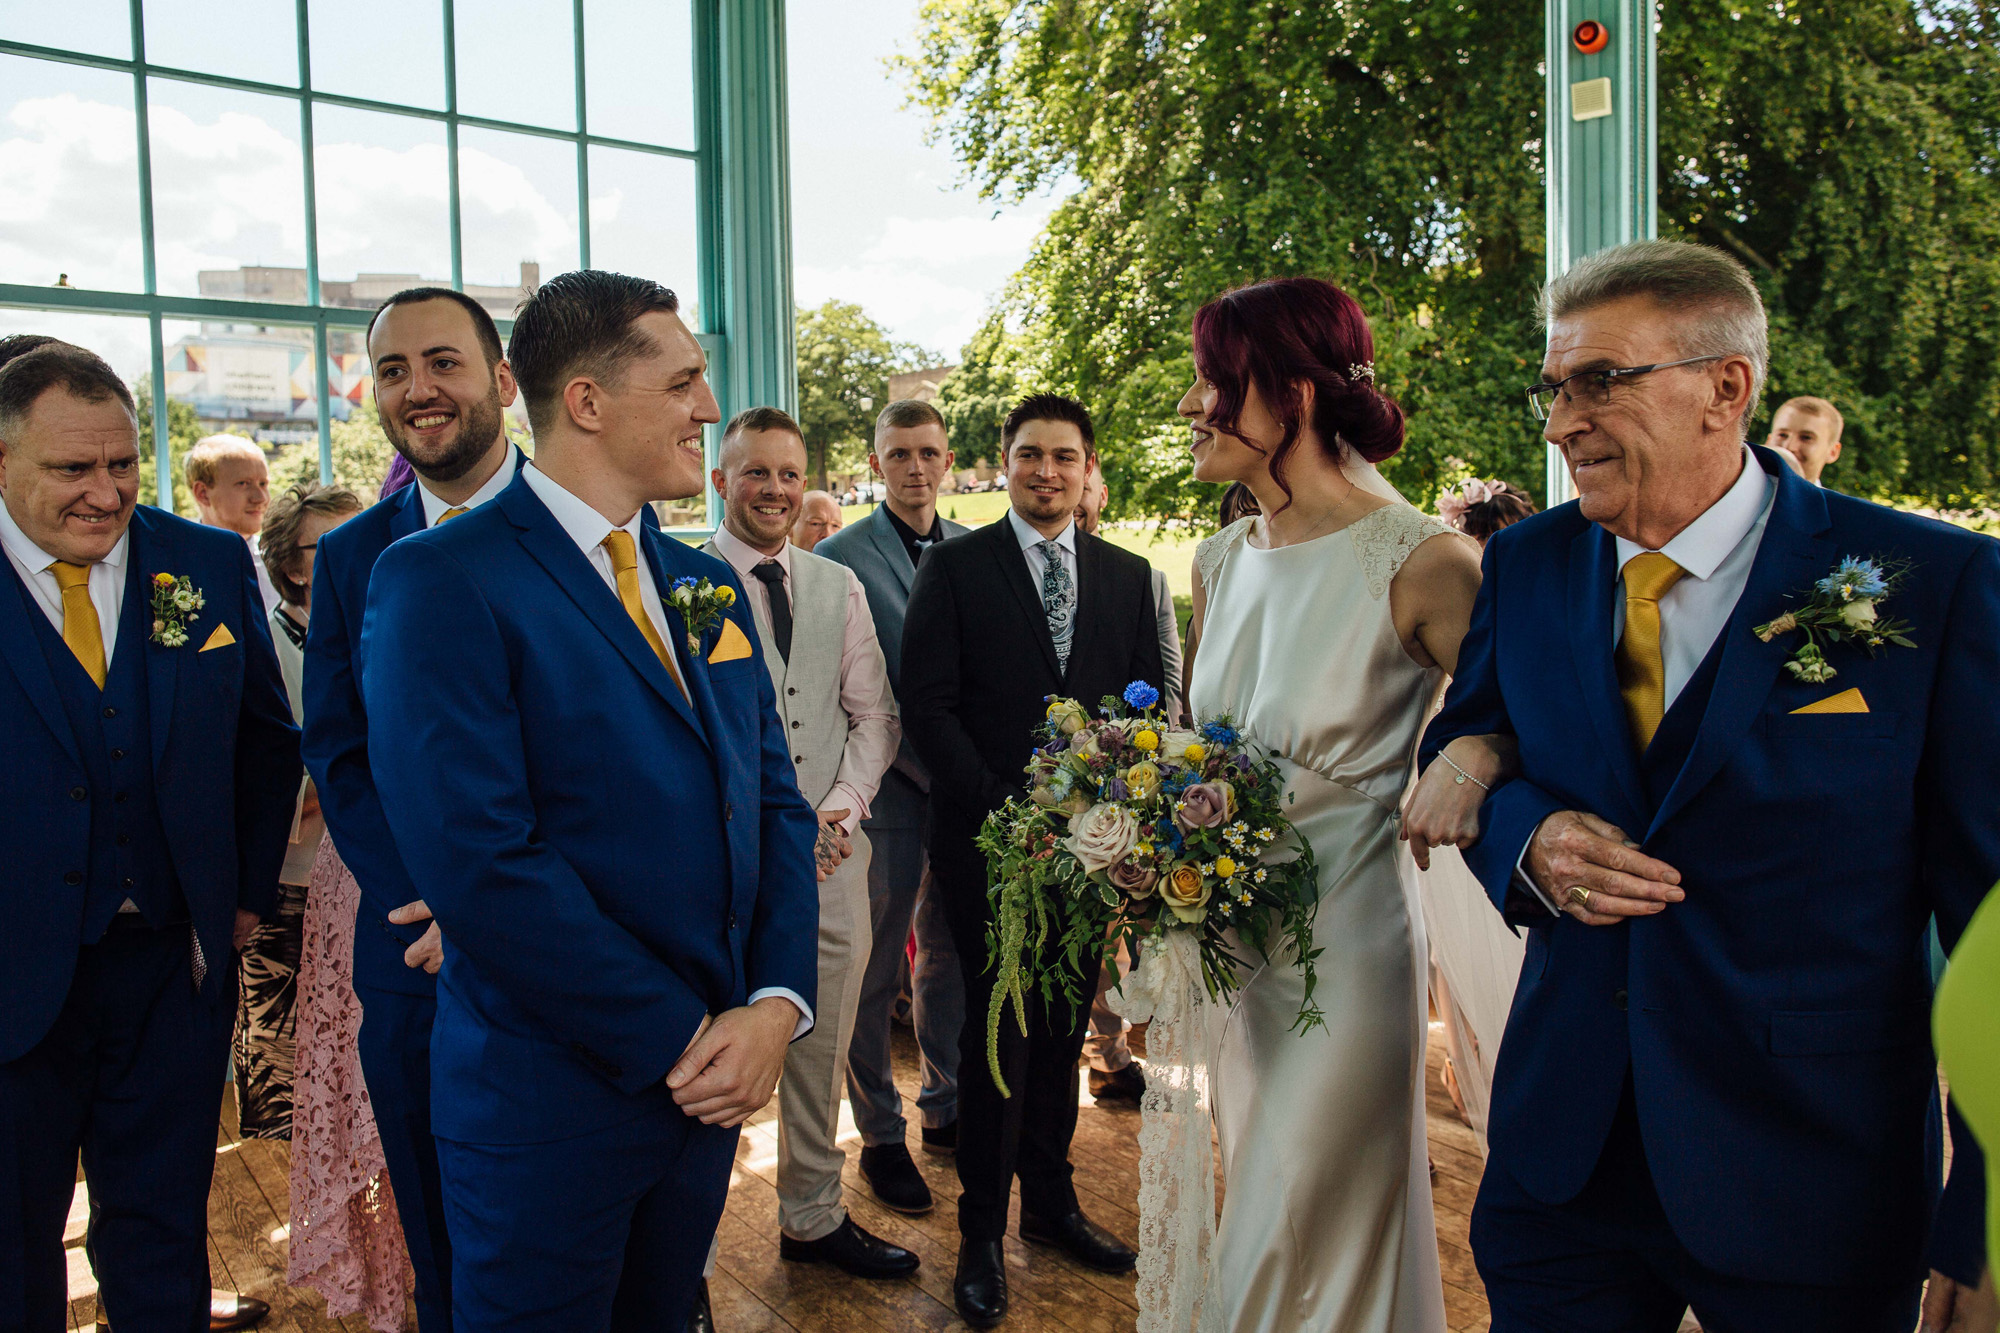 Sarah-Honeysuckle-Bias-Cut-Silk-Vintage-Inspired-Wedding-Gown-Sheffield-Wedding-Kate-Beaumont-11.jpg